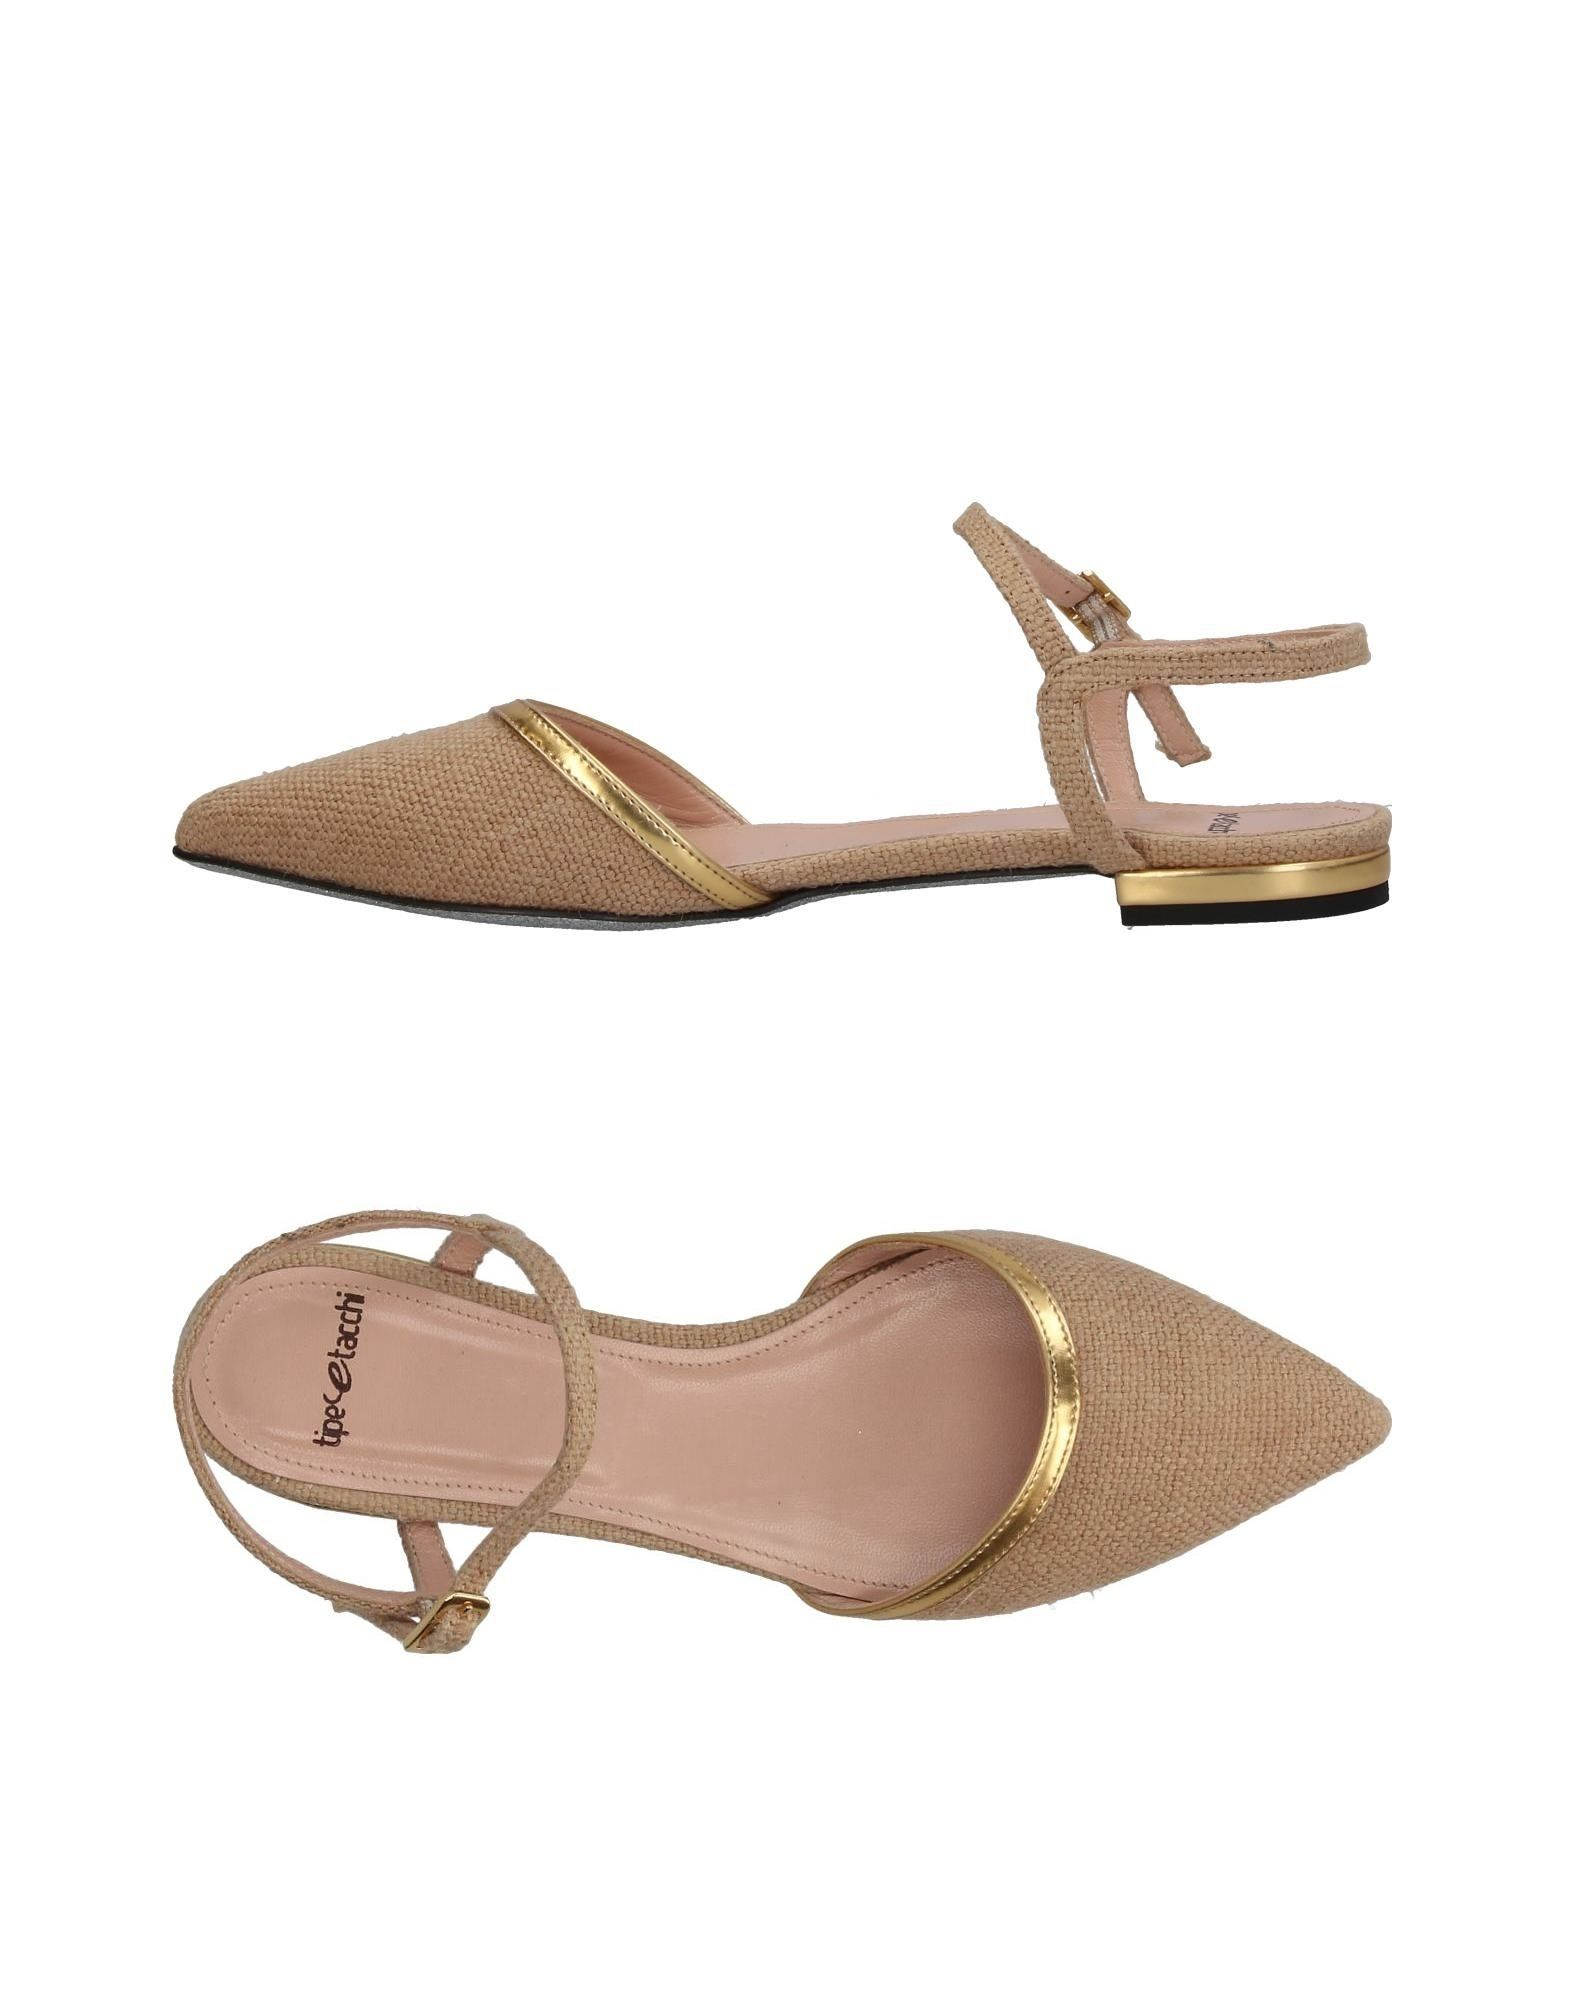 Décolleté Cavallini Donna - scarpe 11483977DA Nuove offerte e scarpe - comode 7bbc7c